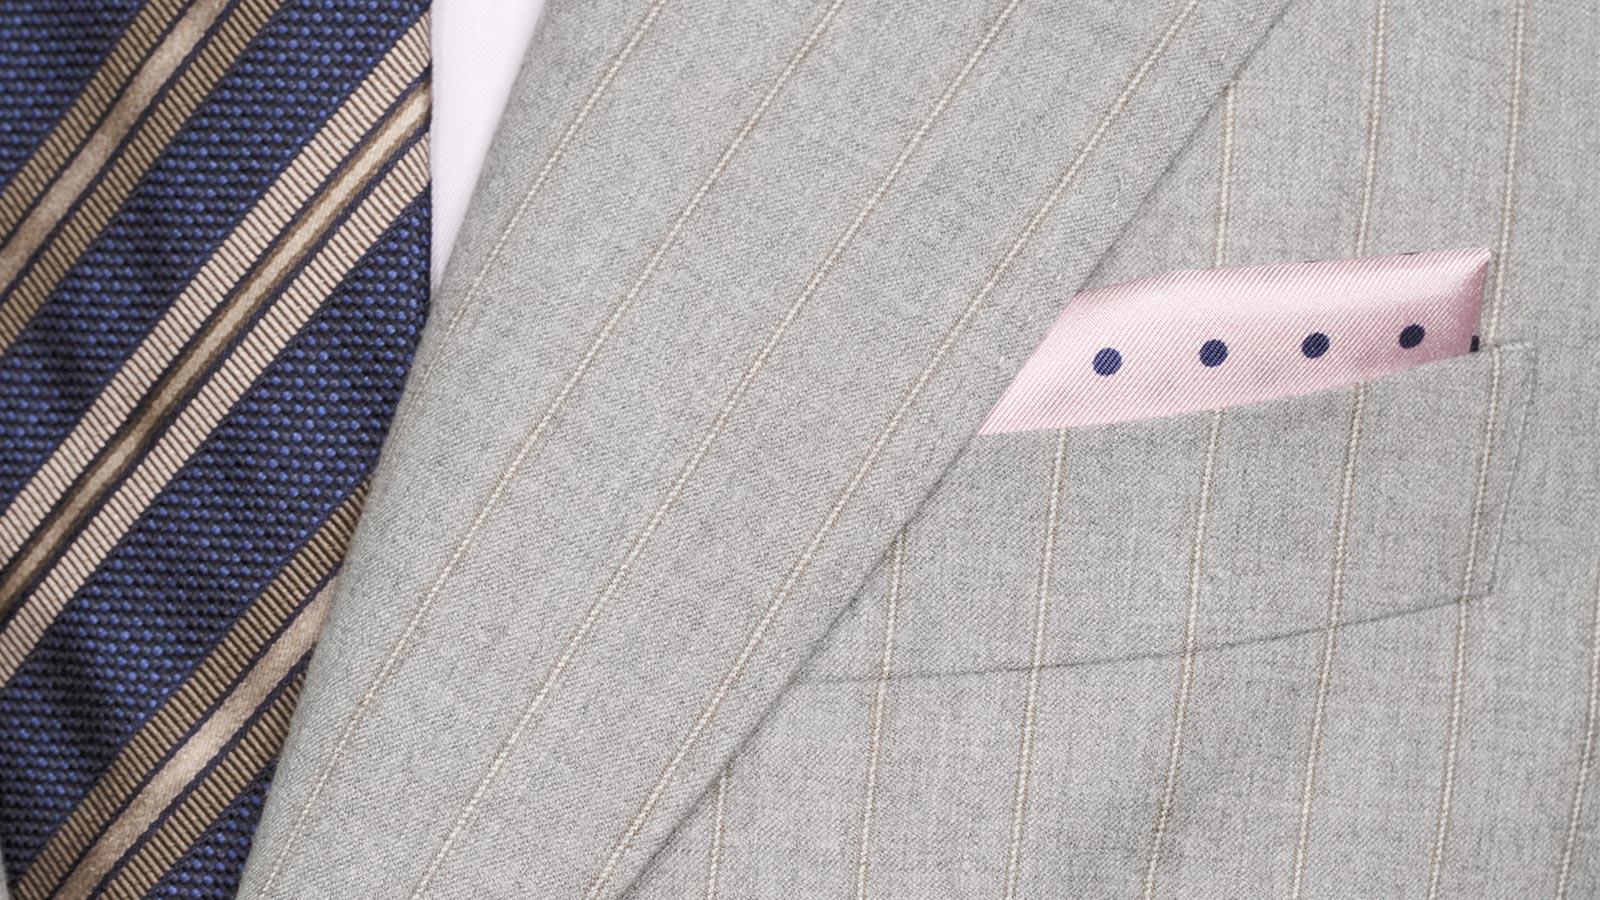 Sartorial Mustard Stripe Light Grey 160s Suit - slider image 1